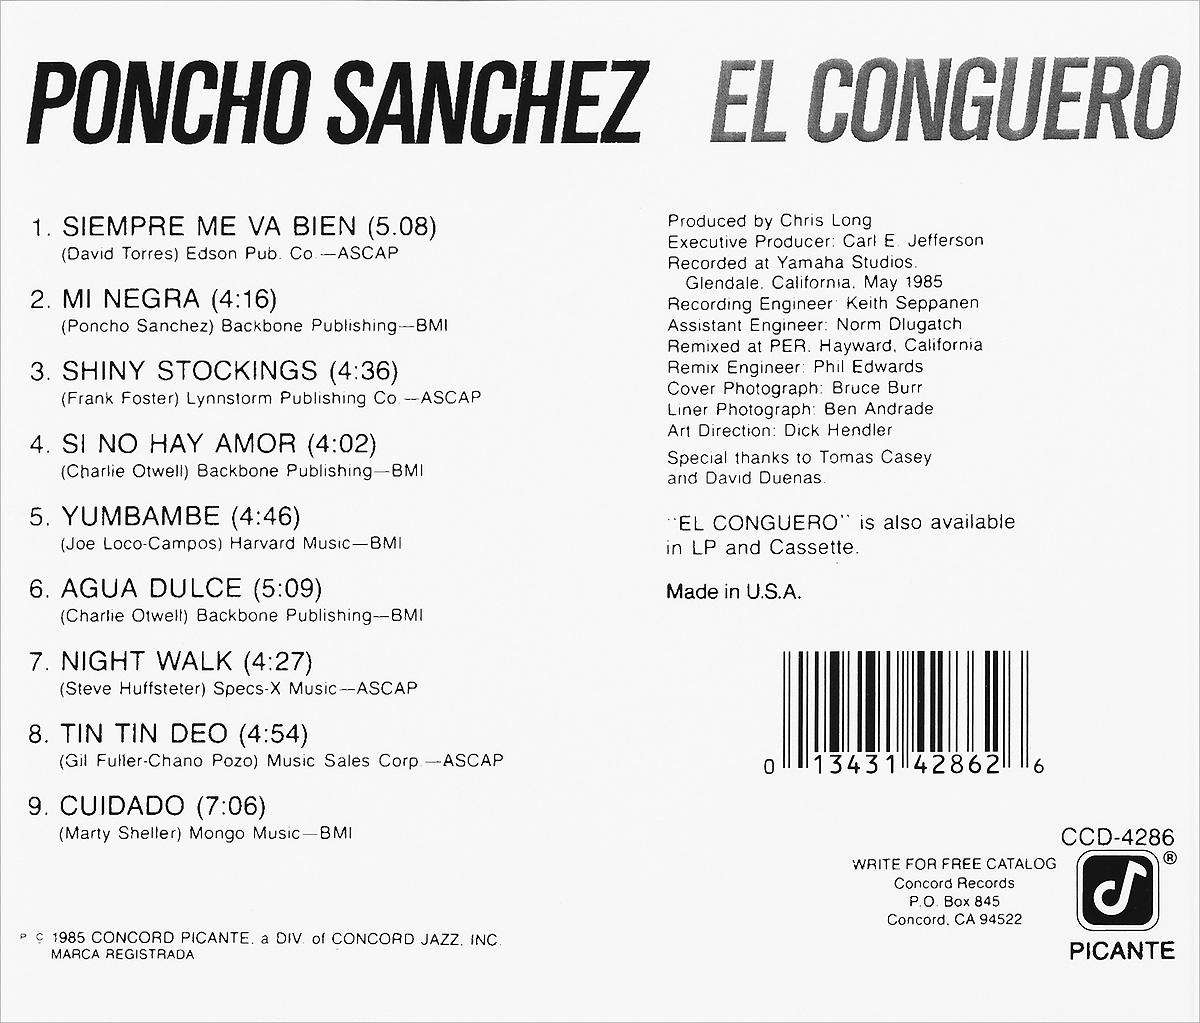 Poncho Sanchez. El Conguero. Пончо Санчез